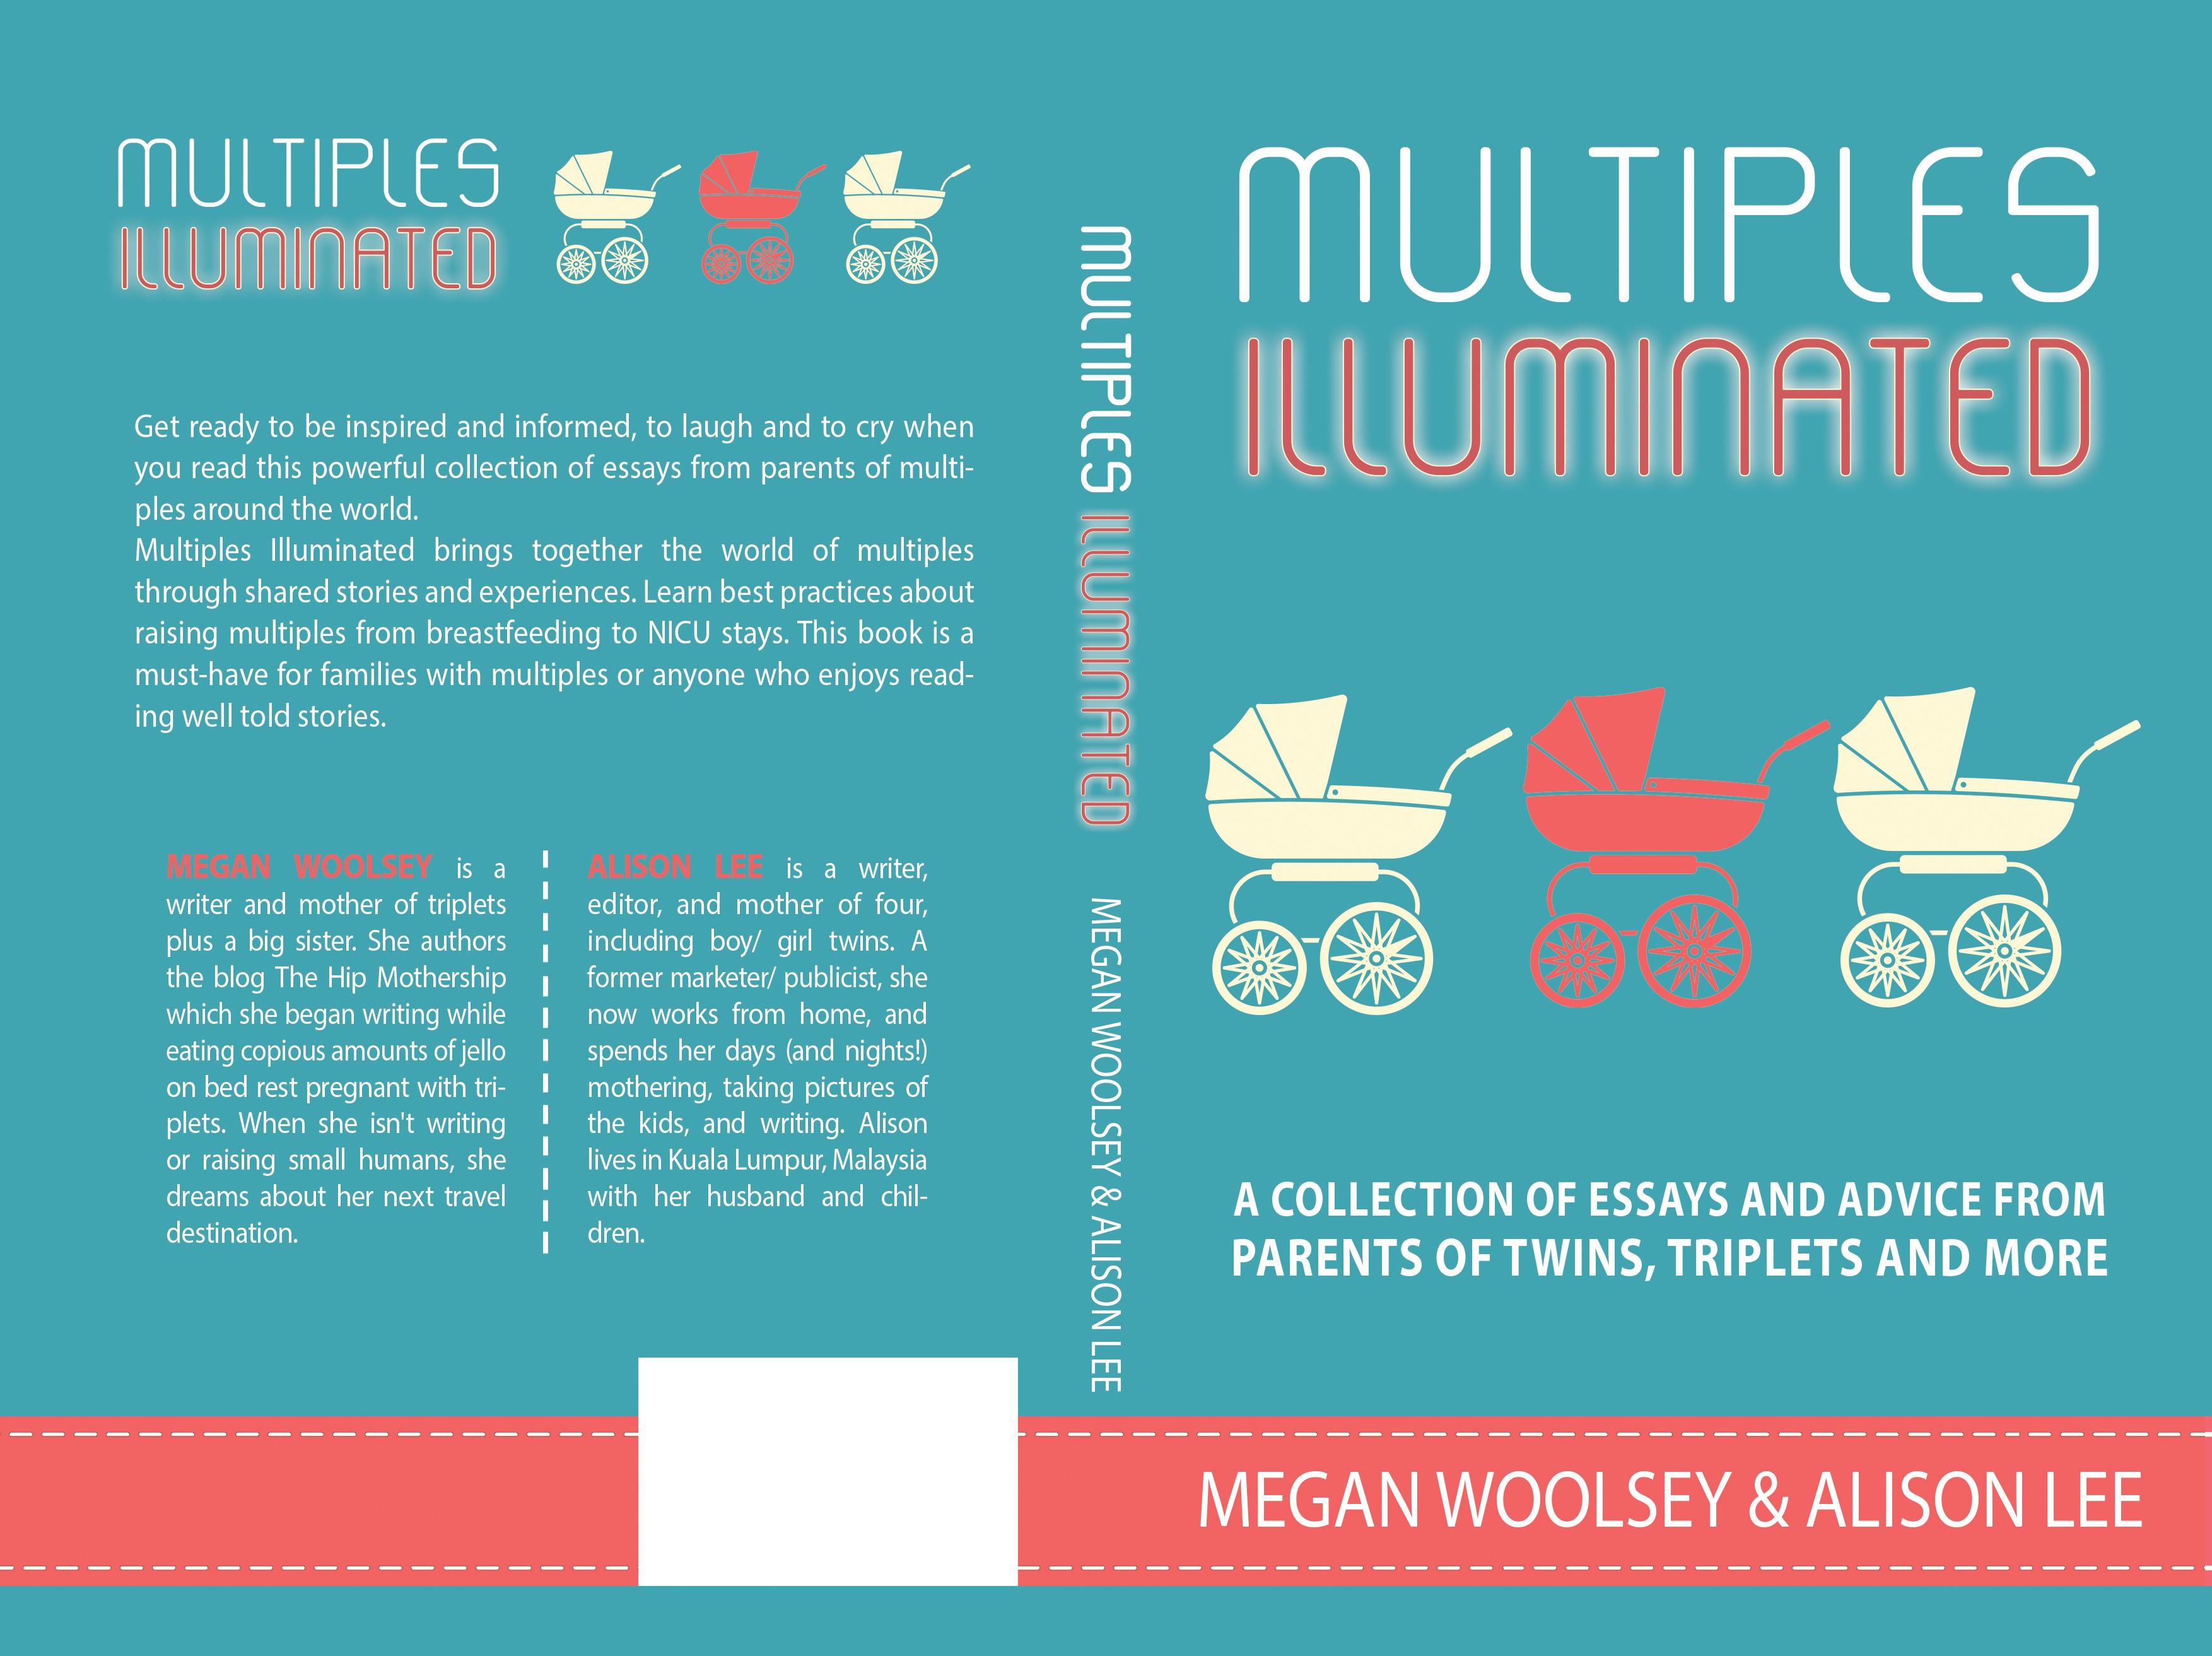 Multiples Illuminated